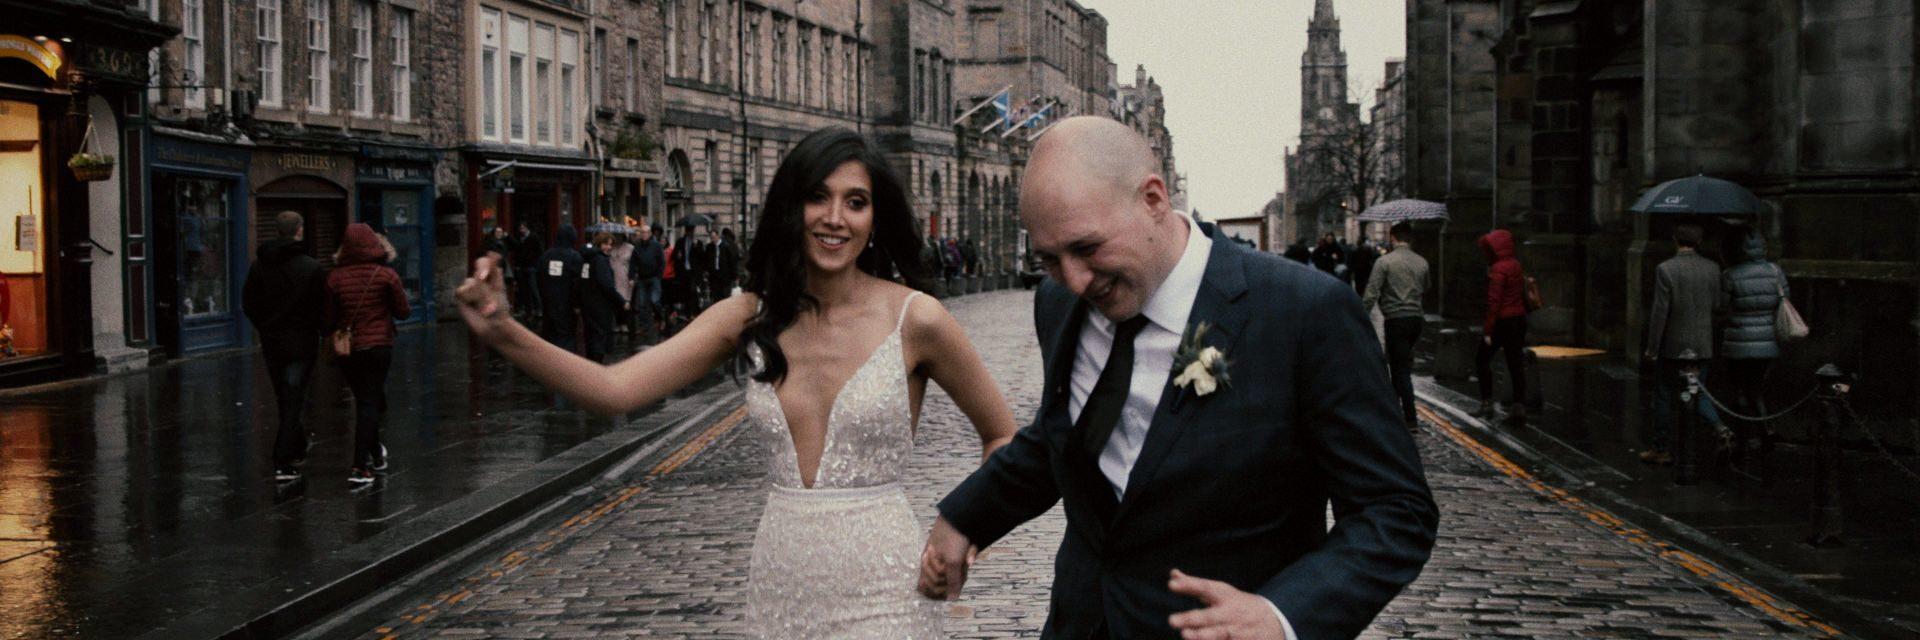 Fjadrargljufur Canyon-wedding-videographer-cinemate-films-04